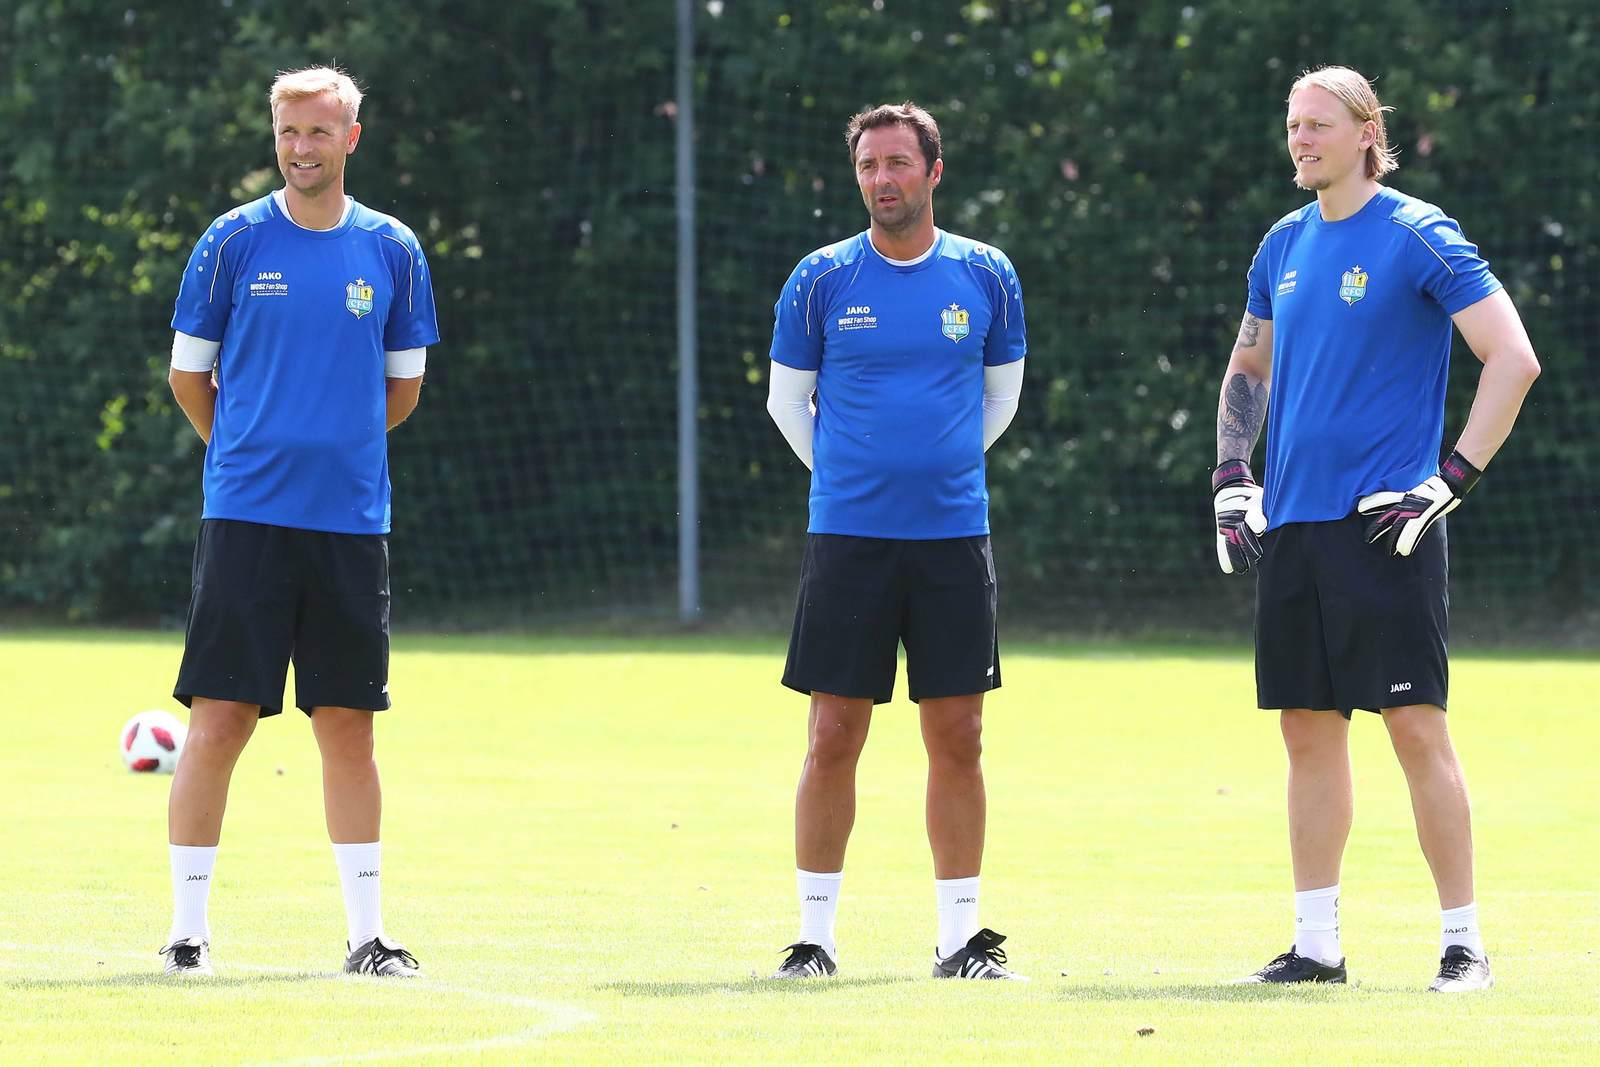 David Bergner, Sreto Ristic und Marcel Höttecke im Training